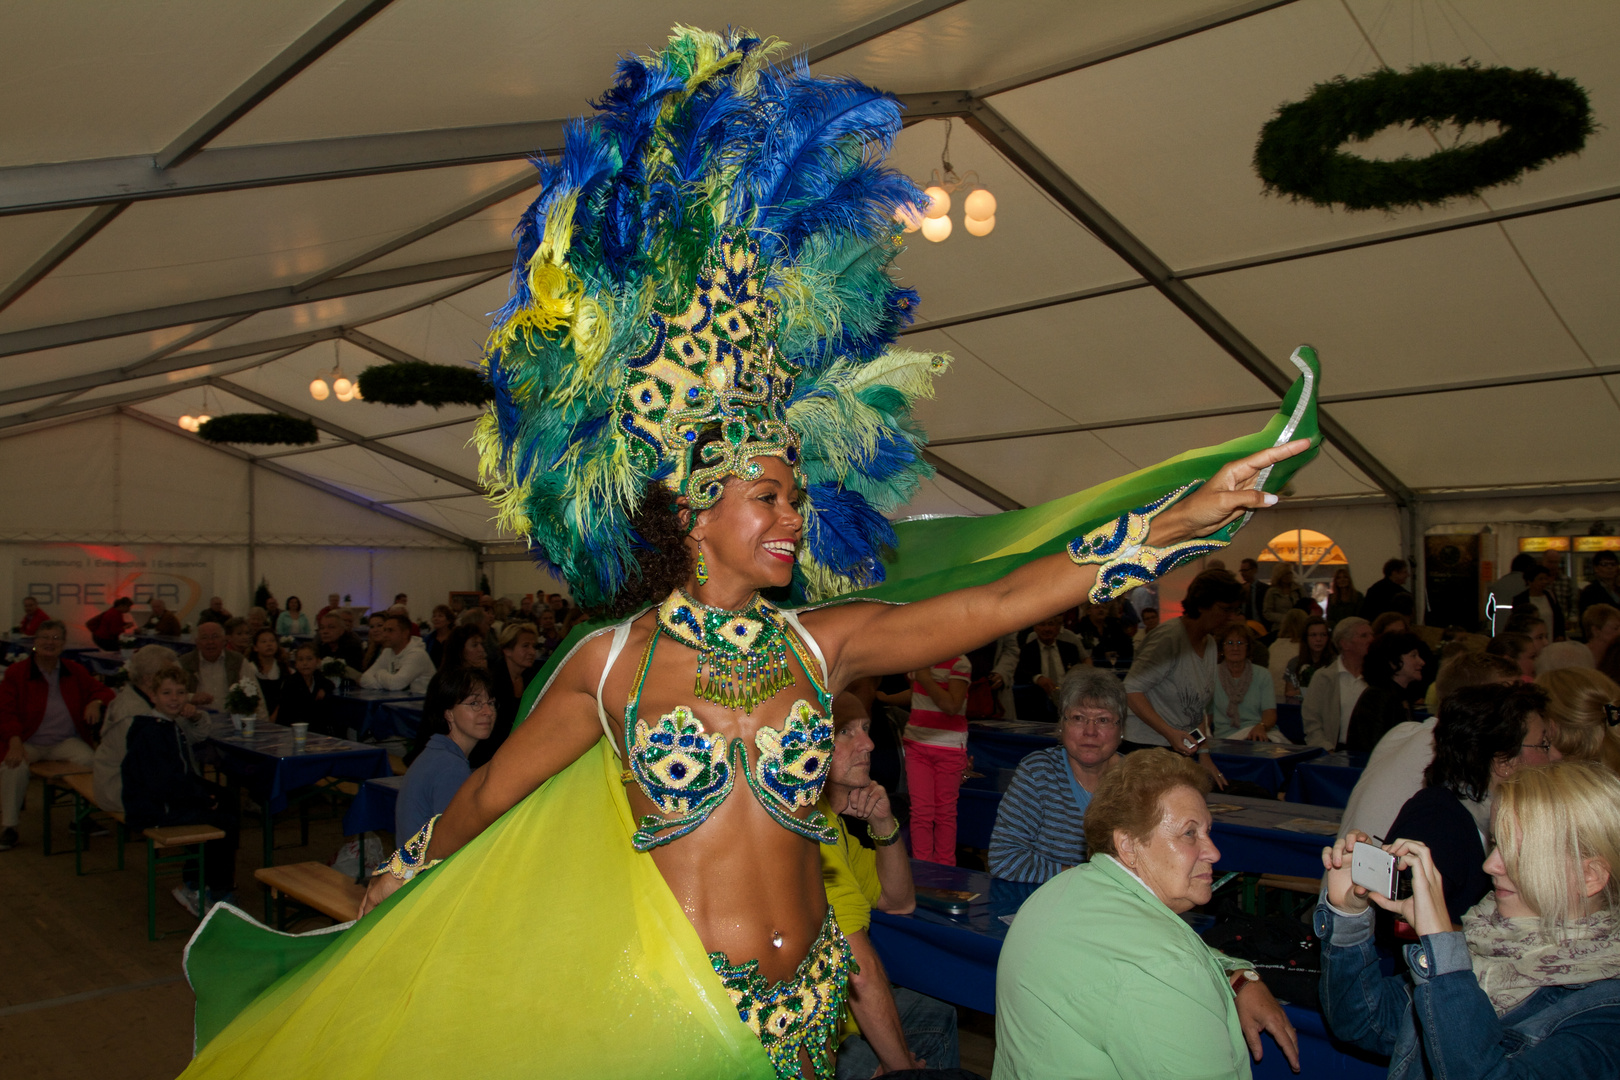 Copacabana-Sambashow Nr. 4617